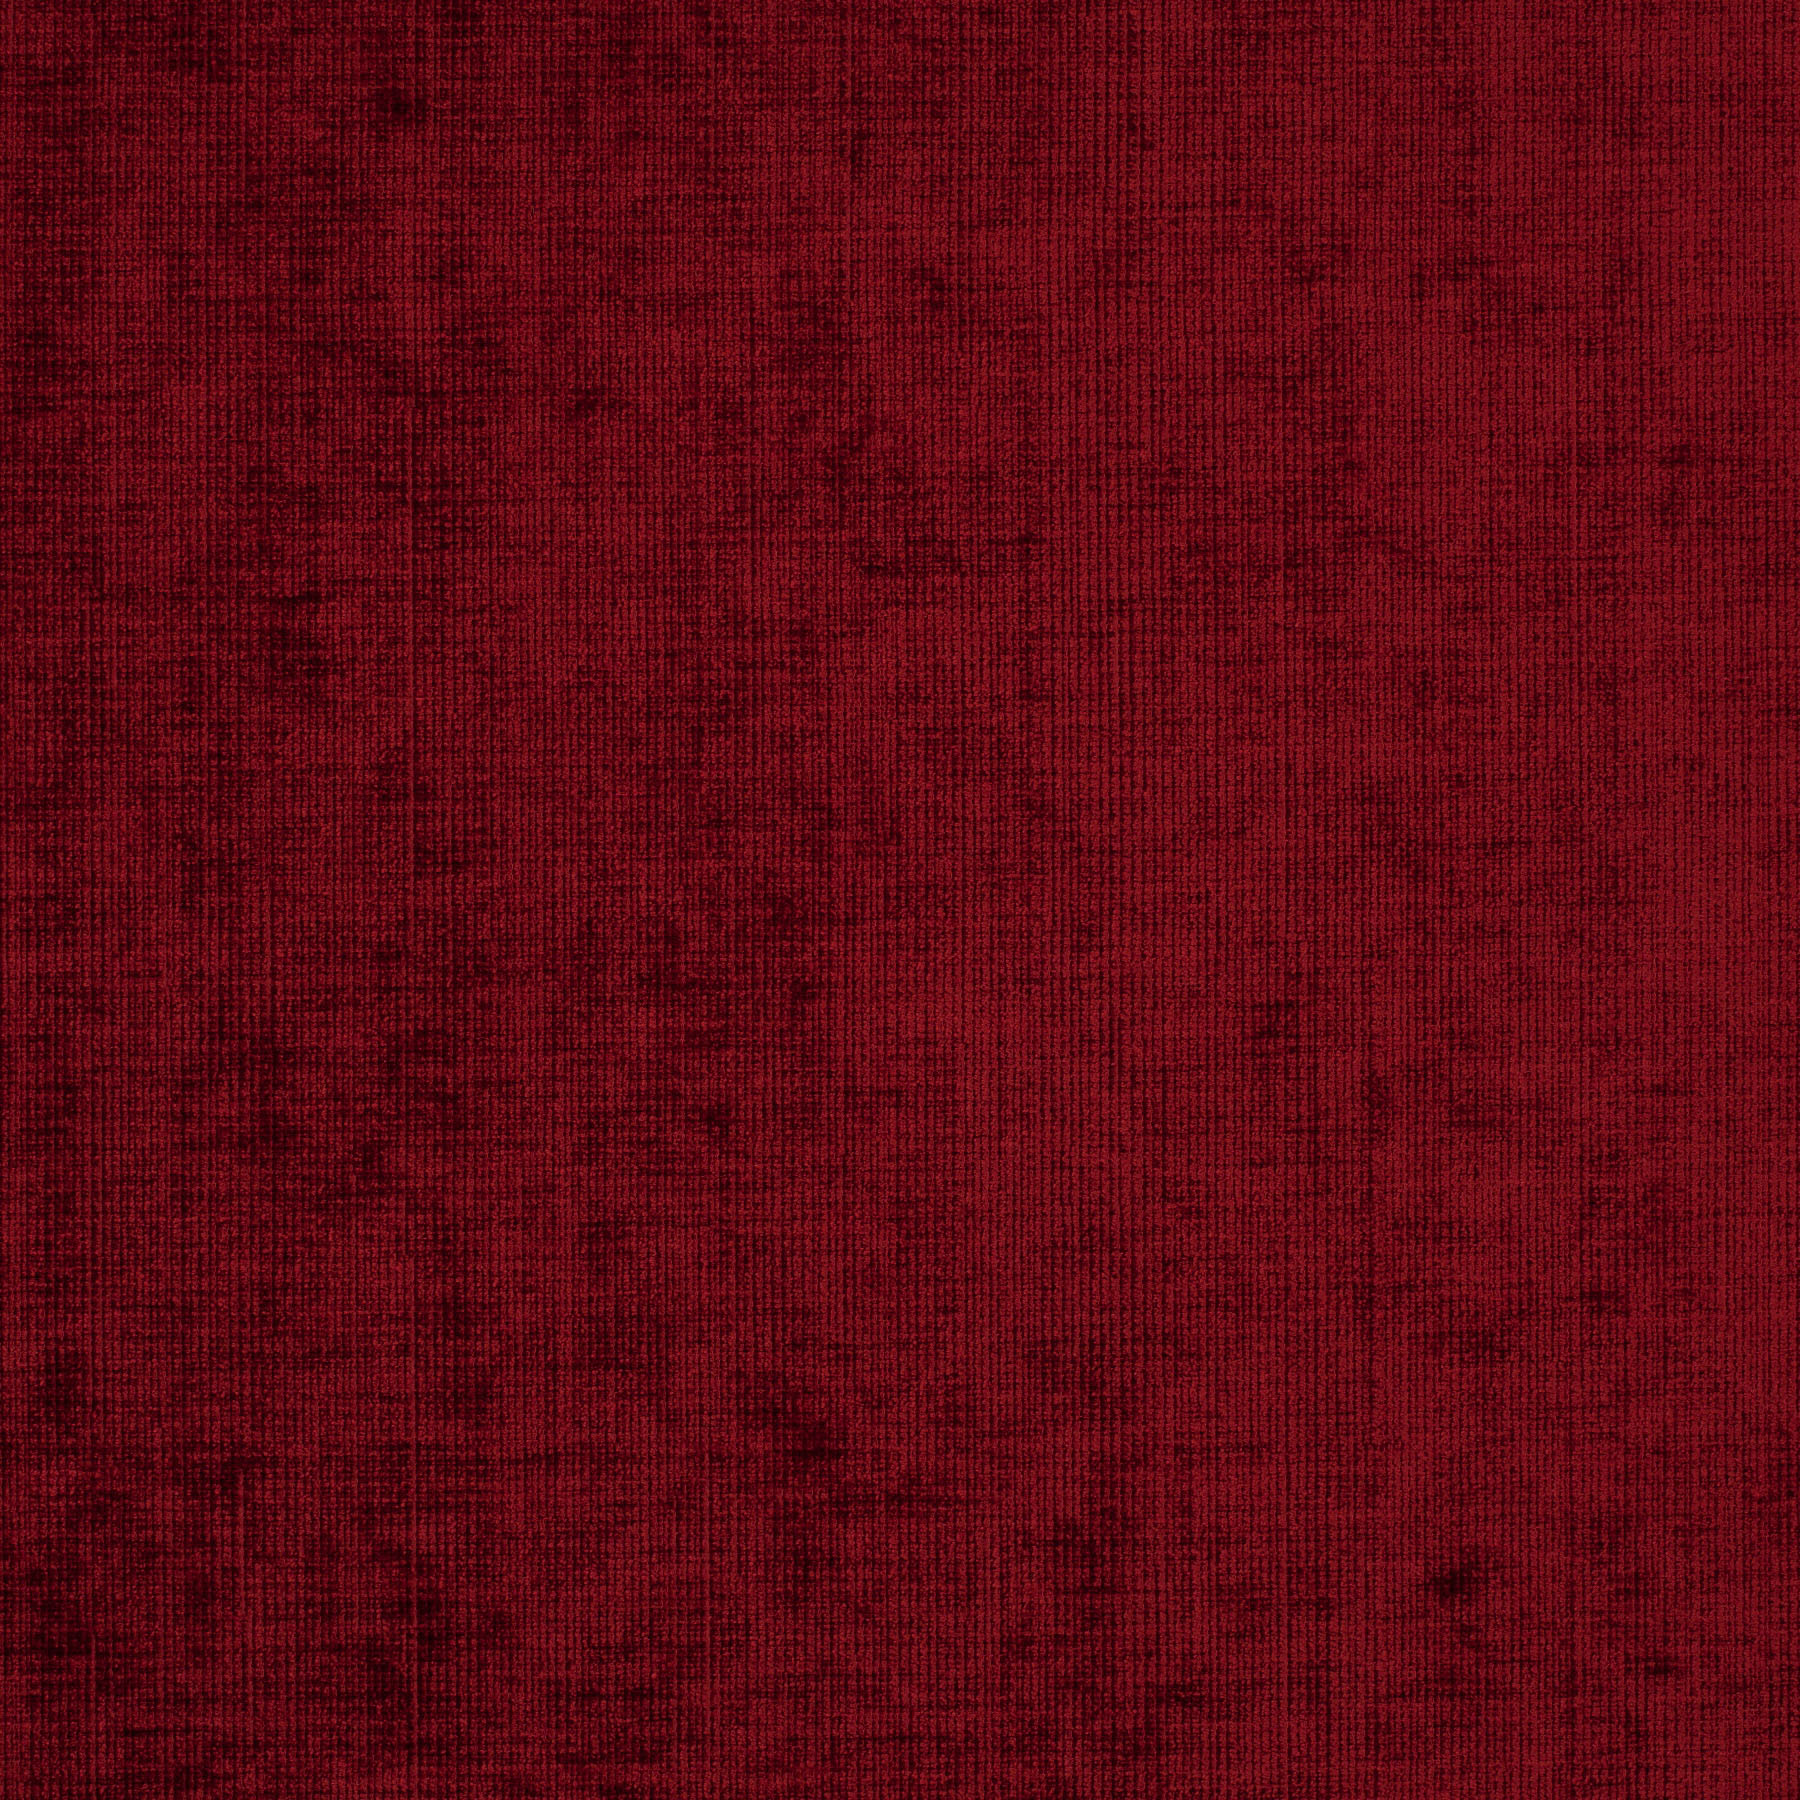 Upholstery Fabric Luciano 1 1255 011 Jab Anstoetz Fabrics